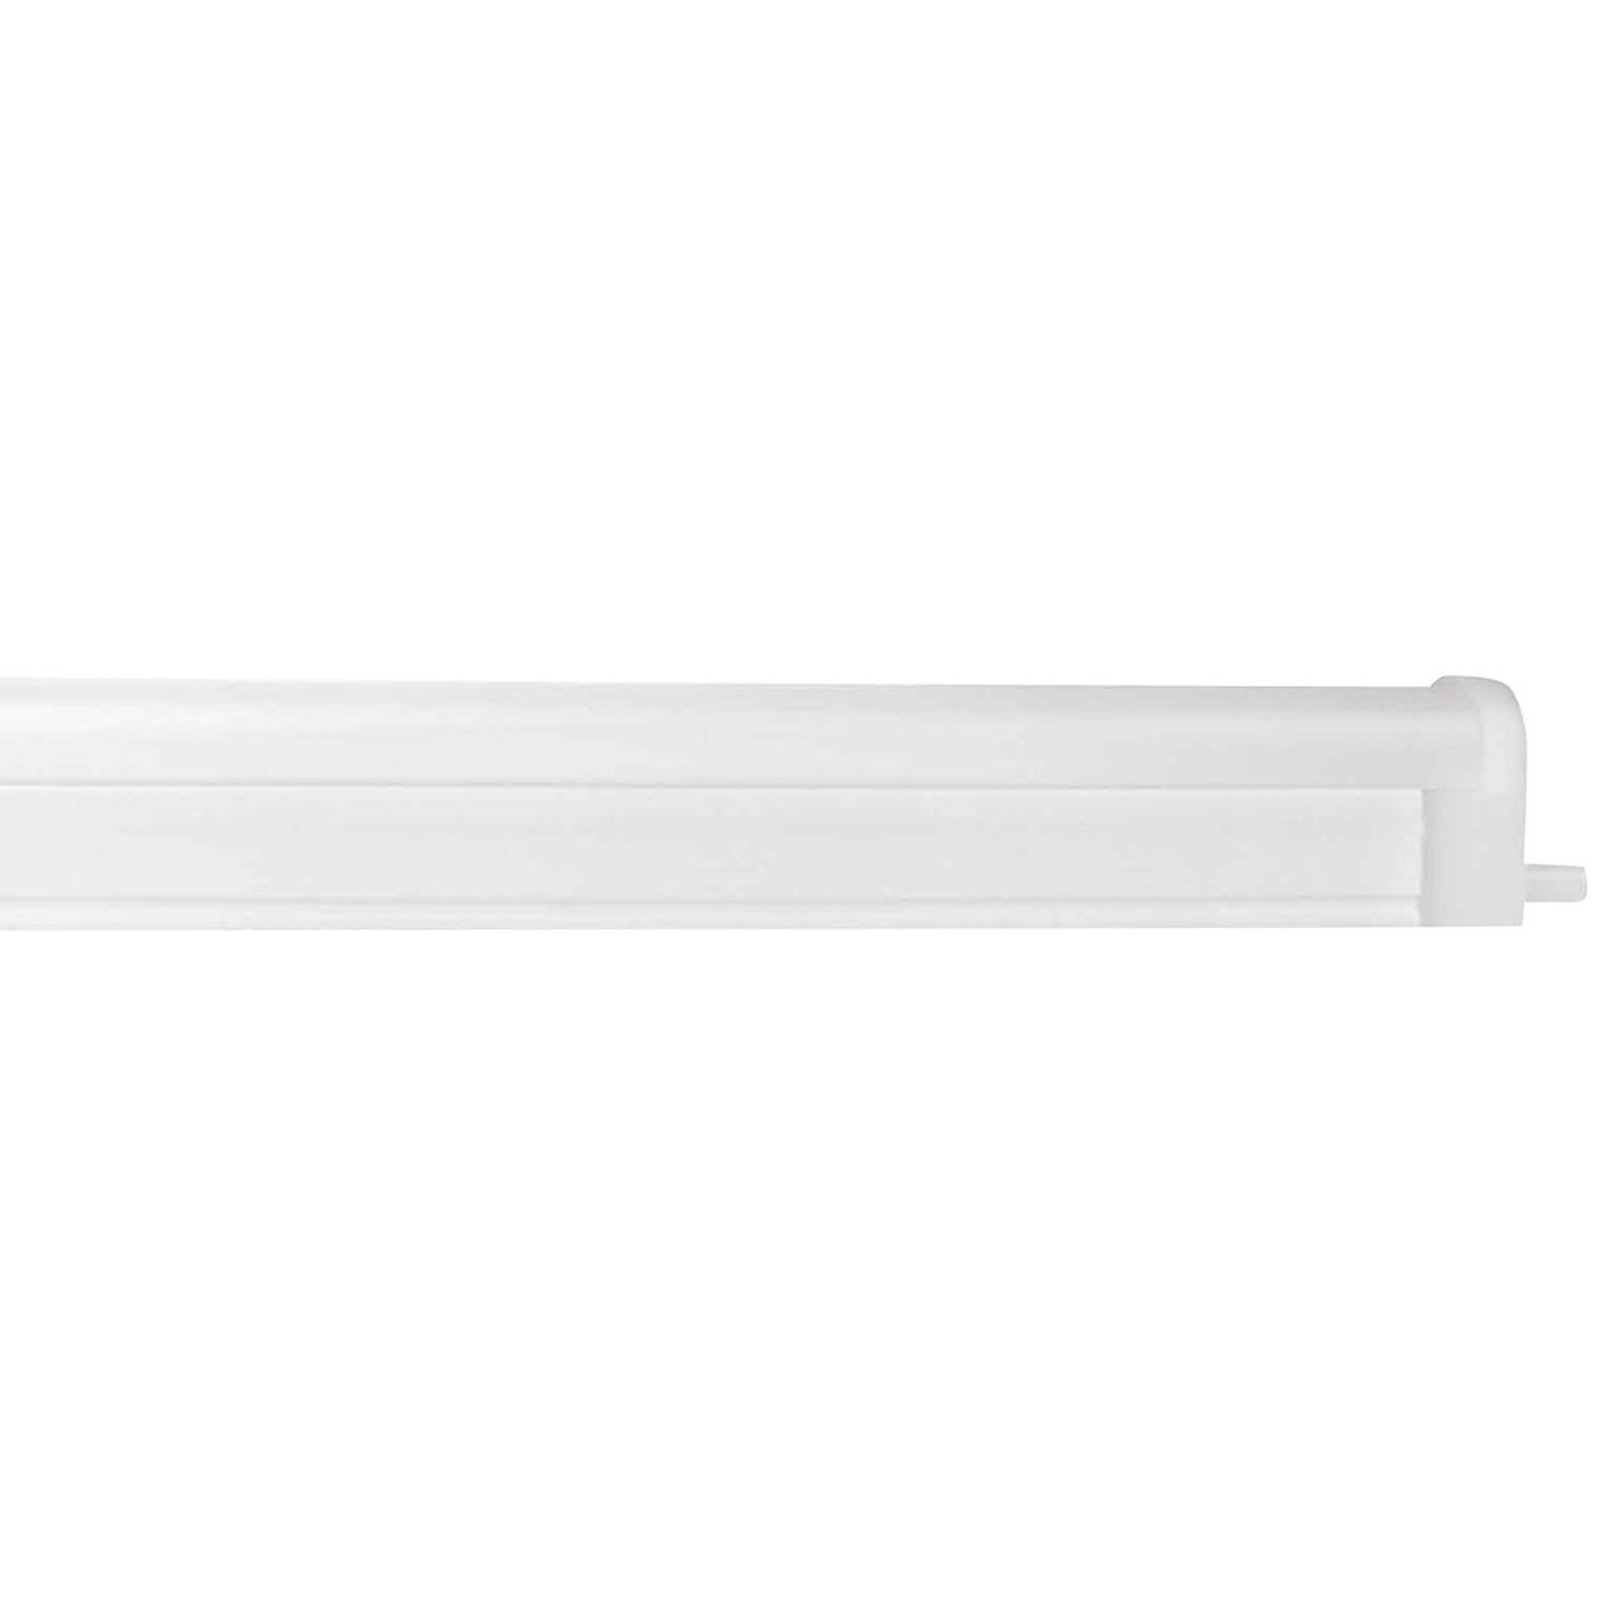 Megaman Pinolite LED-Pflanzenleuchte, 28 cm, 4 W